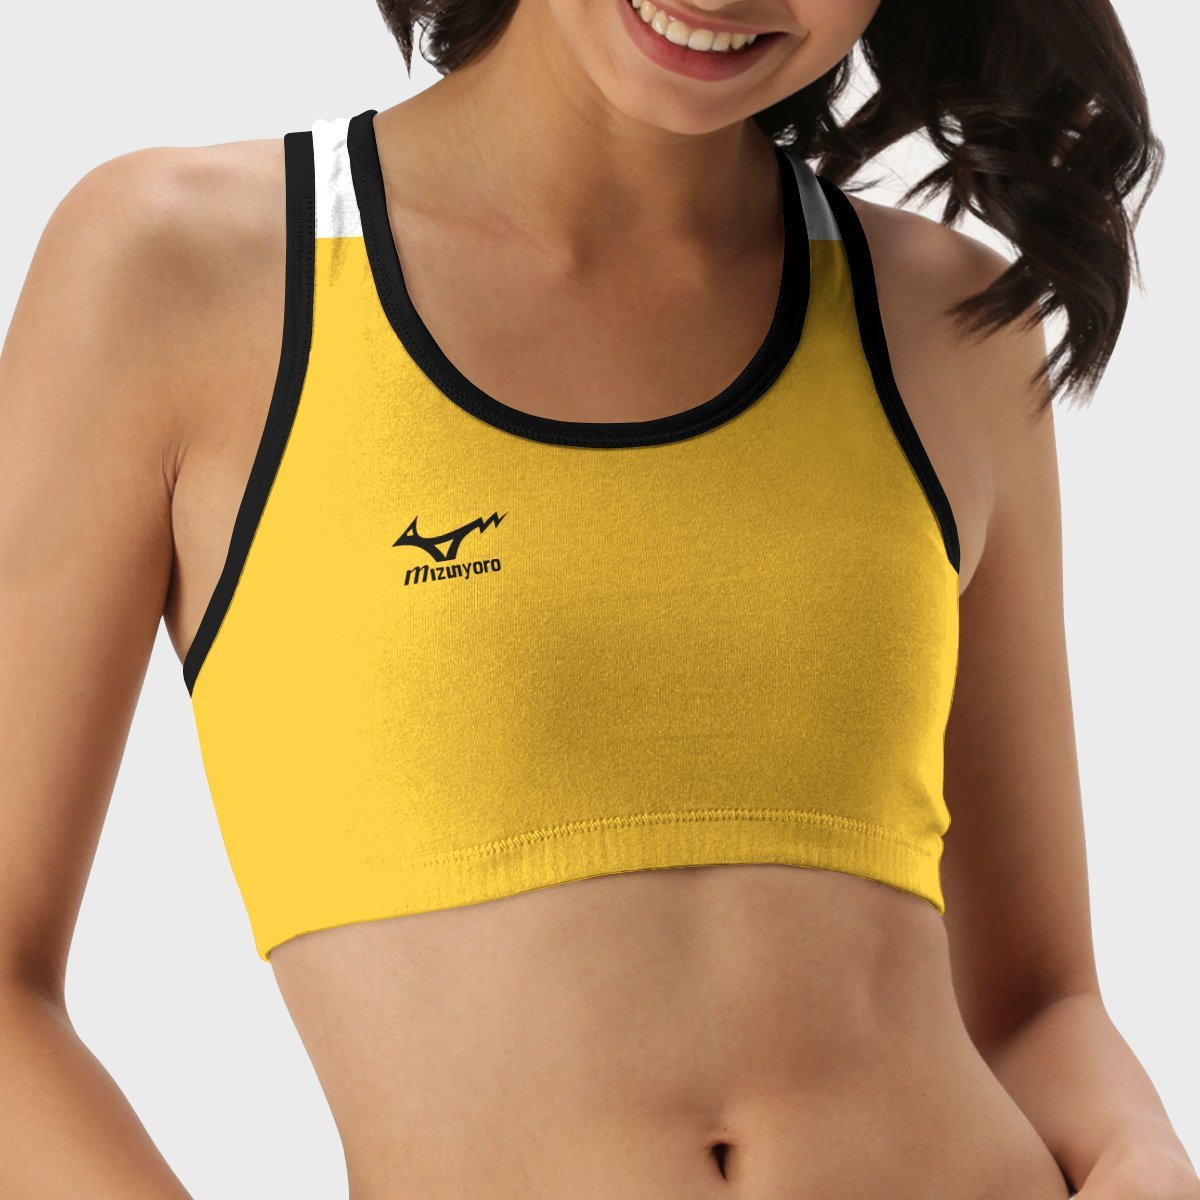 team johzenji active wear set 228403 - Anime Swimsuits